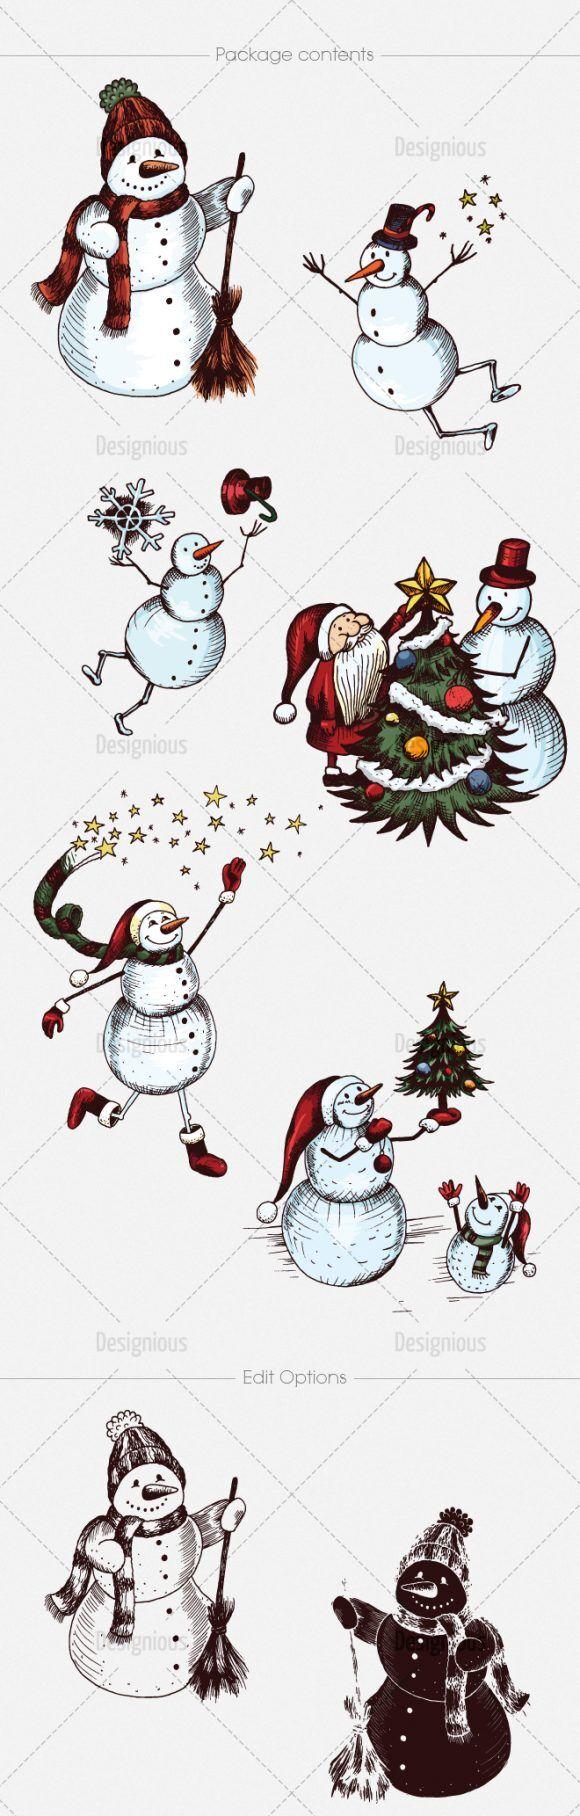 Snowmen Vector Pack 14 Holidays [tag]